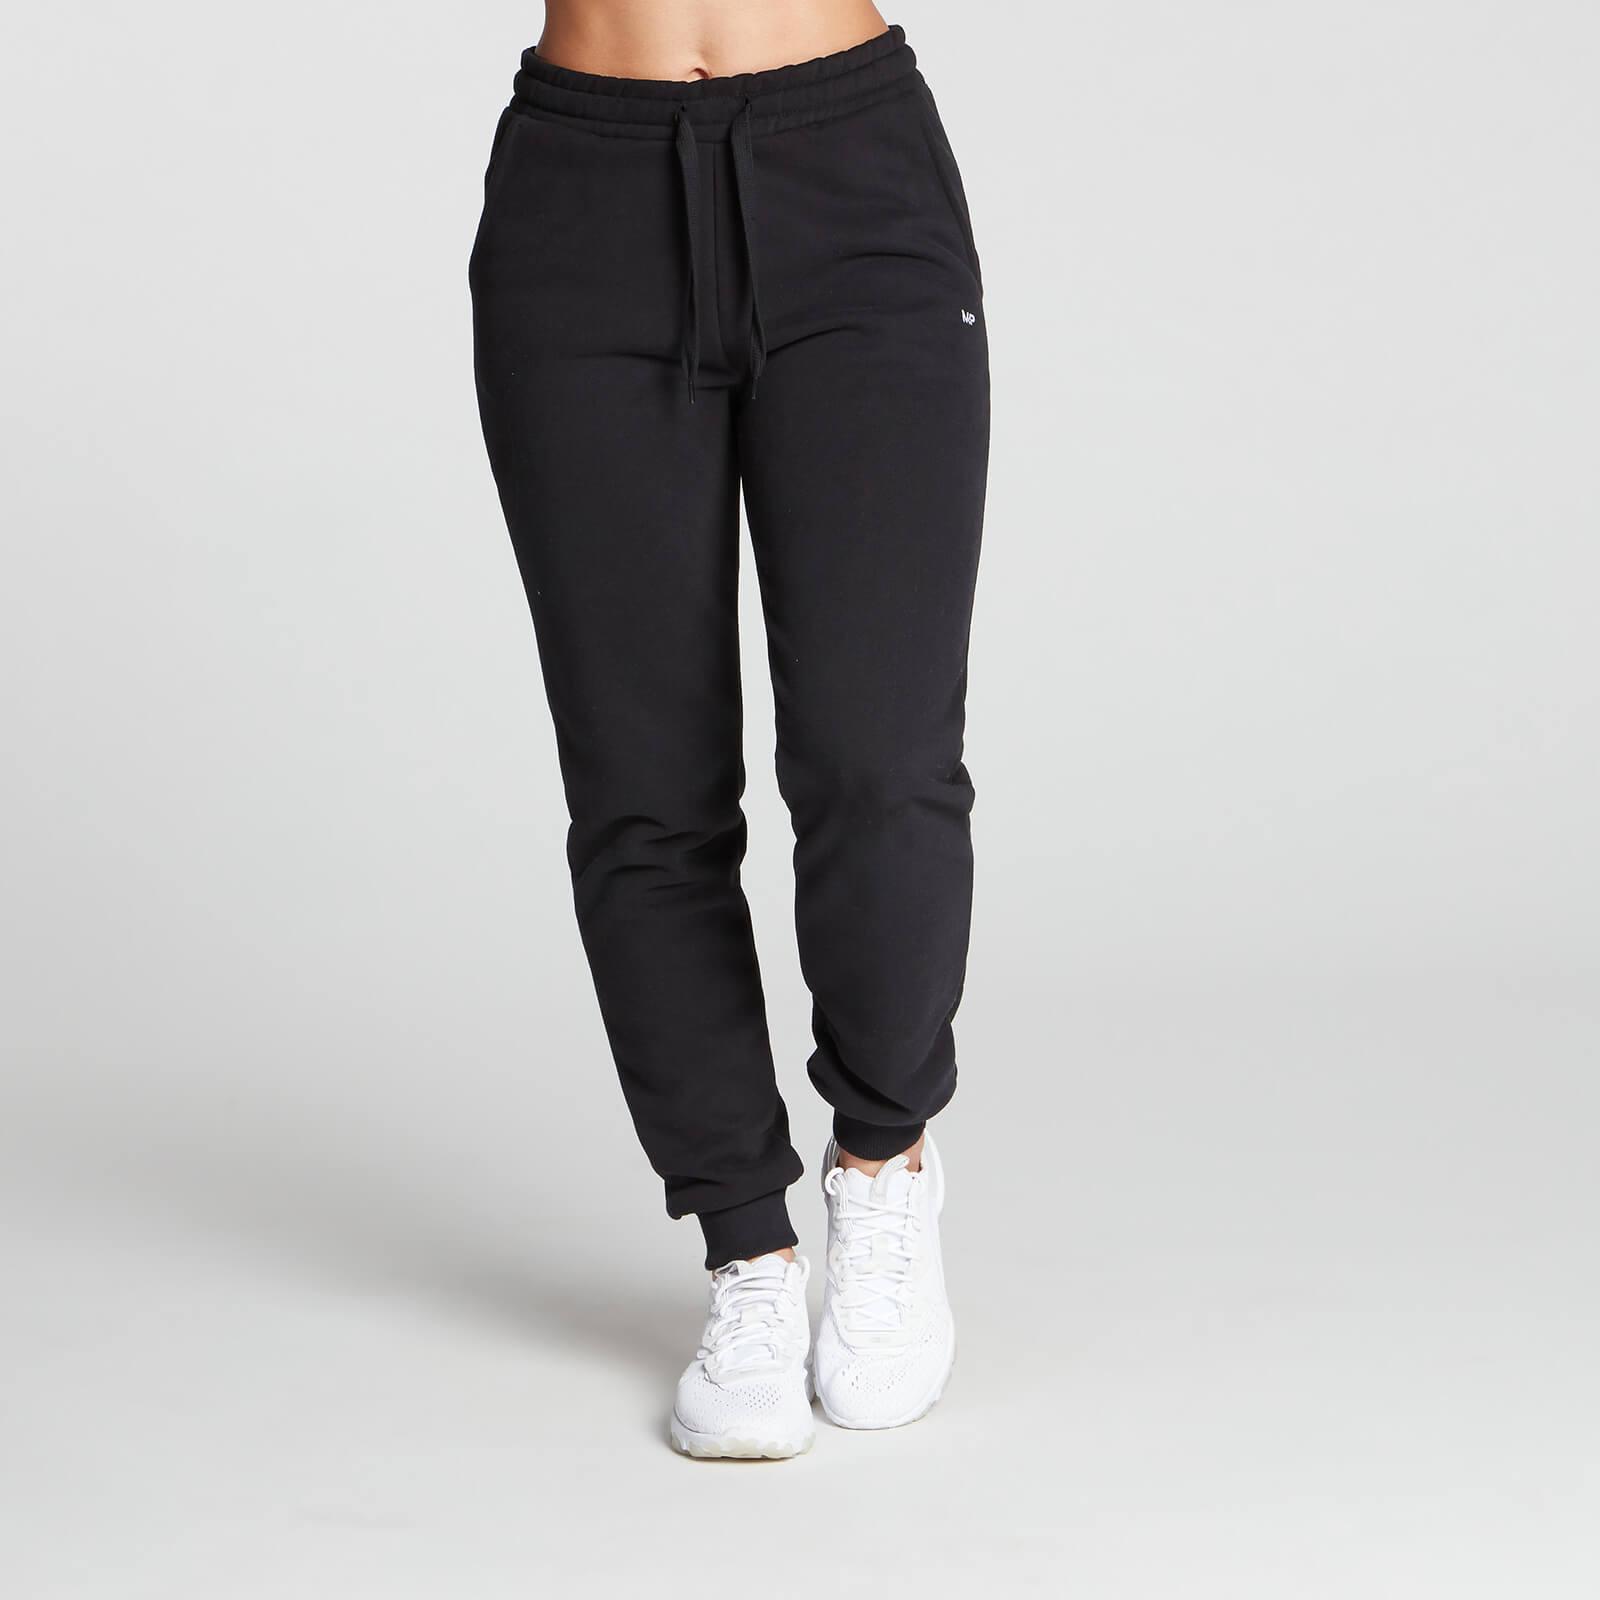 mp pantaloni da jogging  essentials da donna - neri - xs